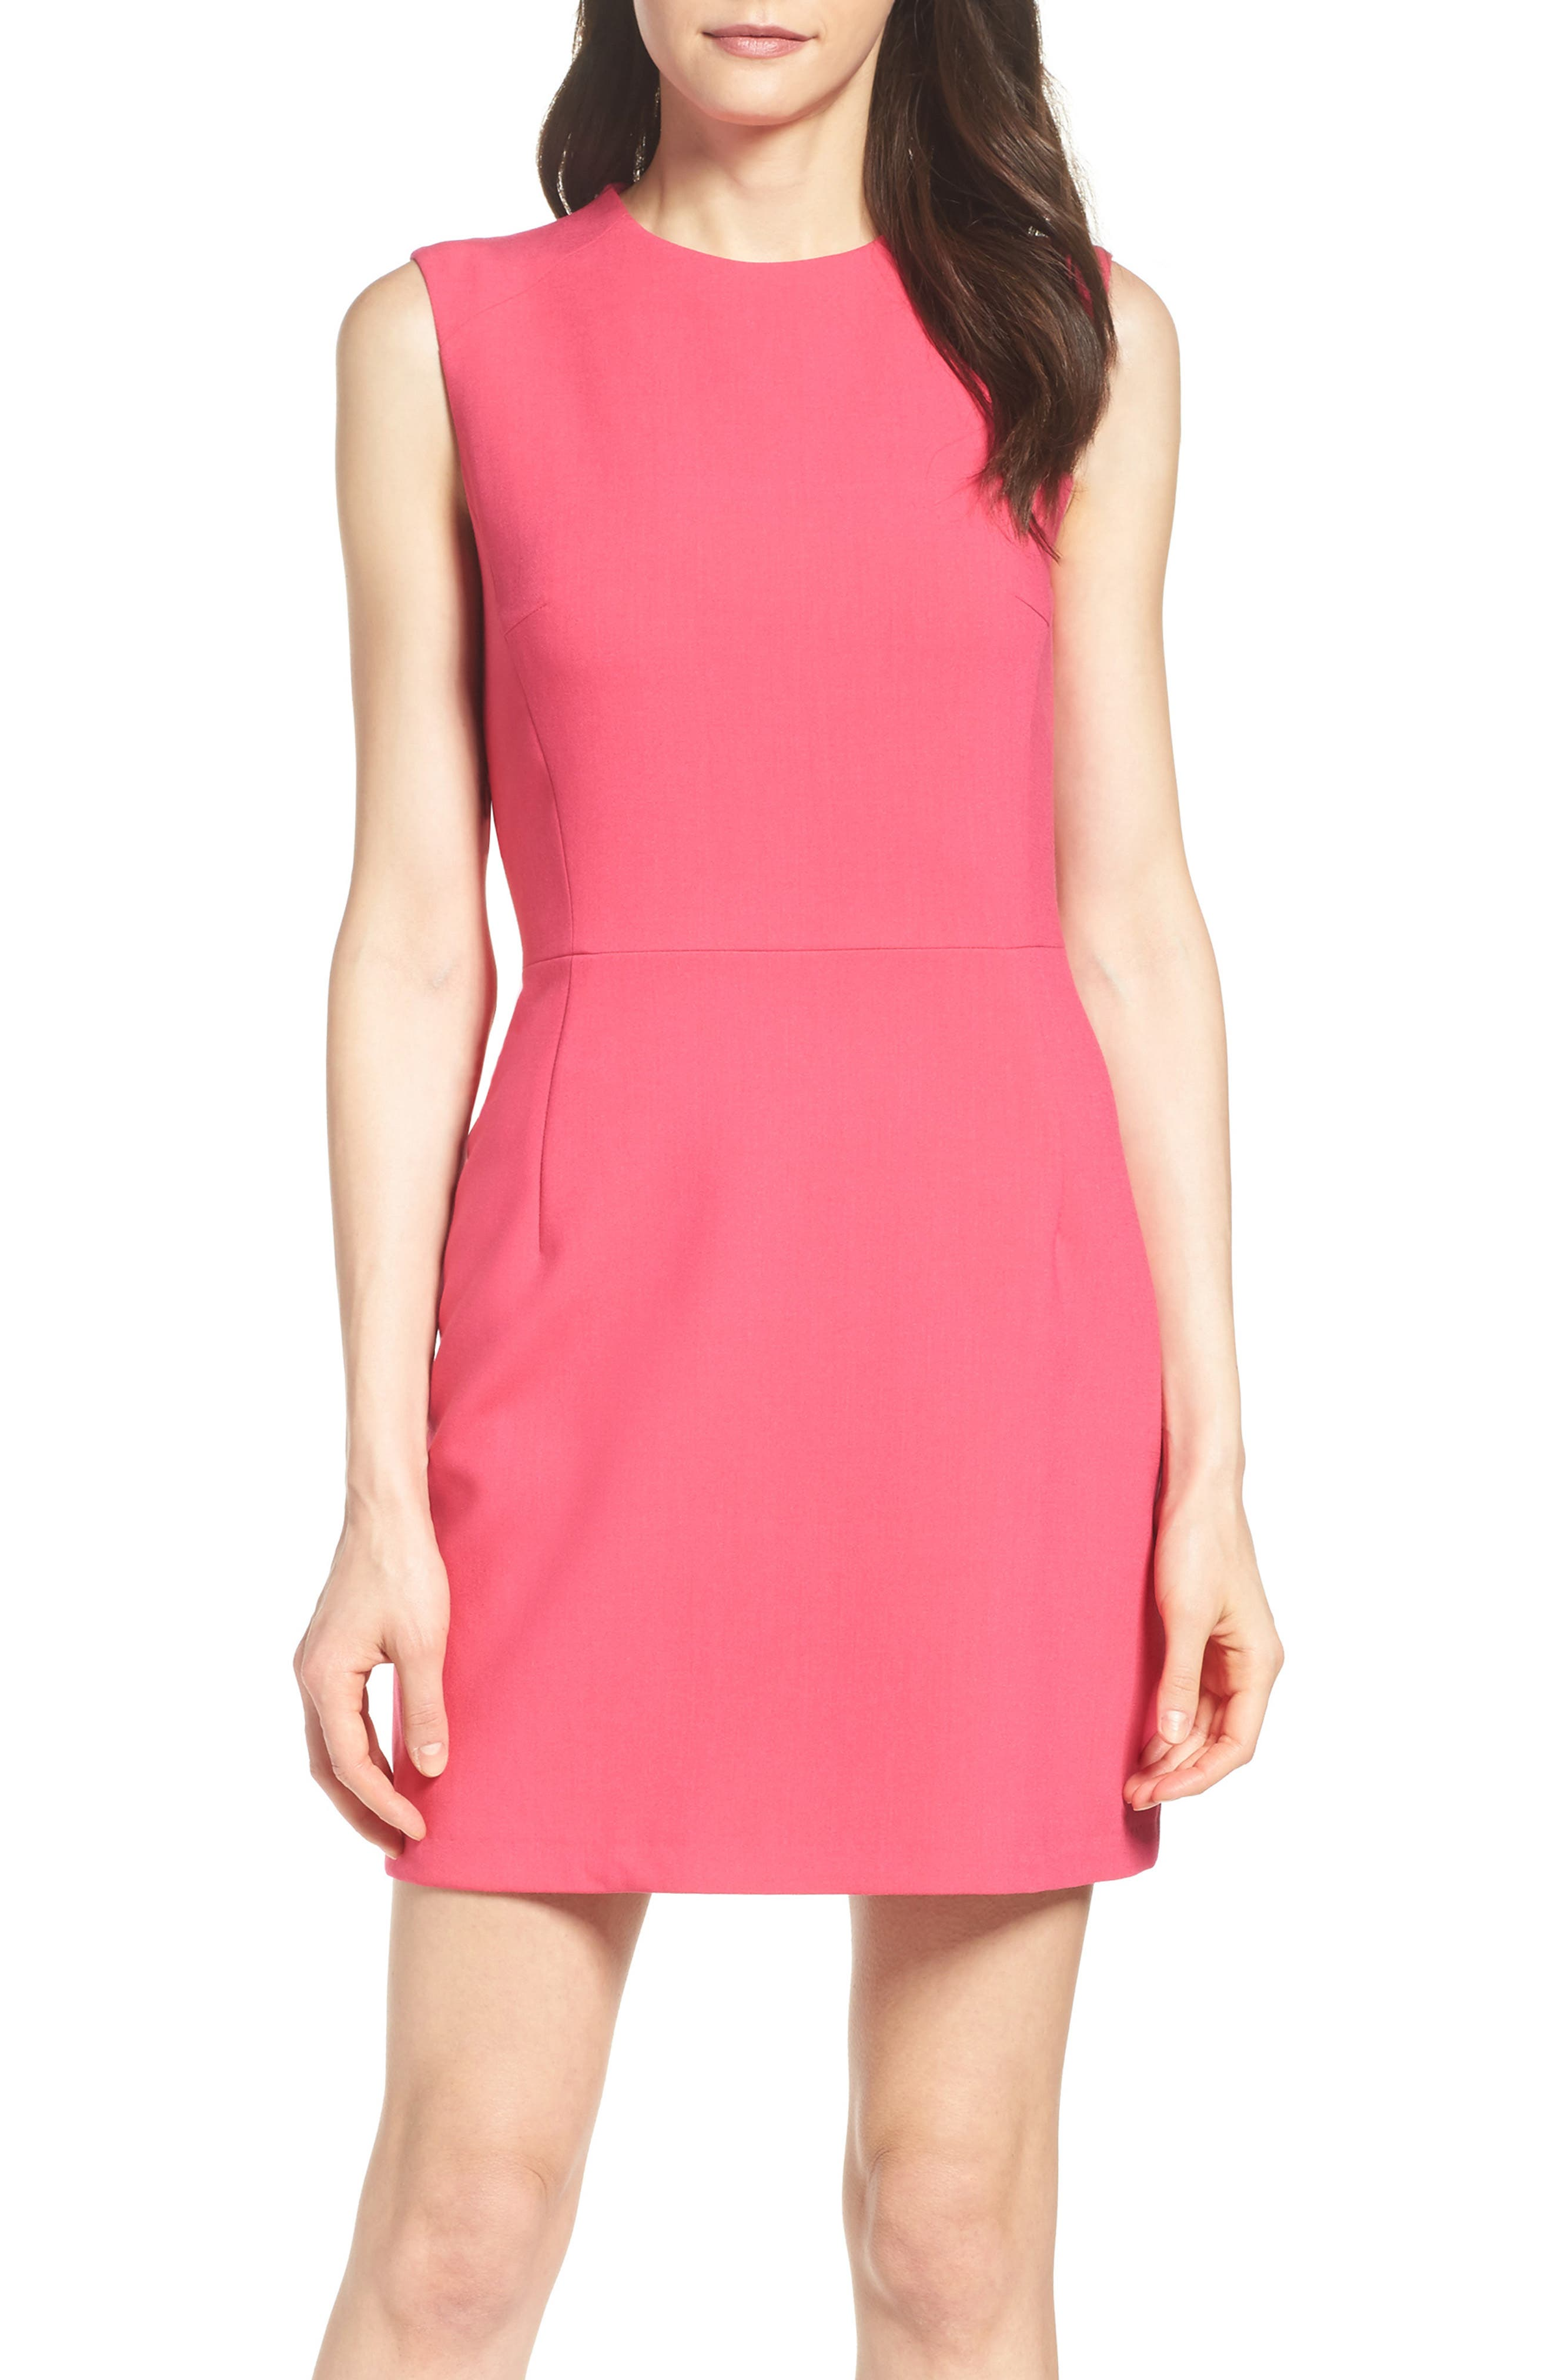 Pink dress cocktail